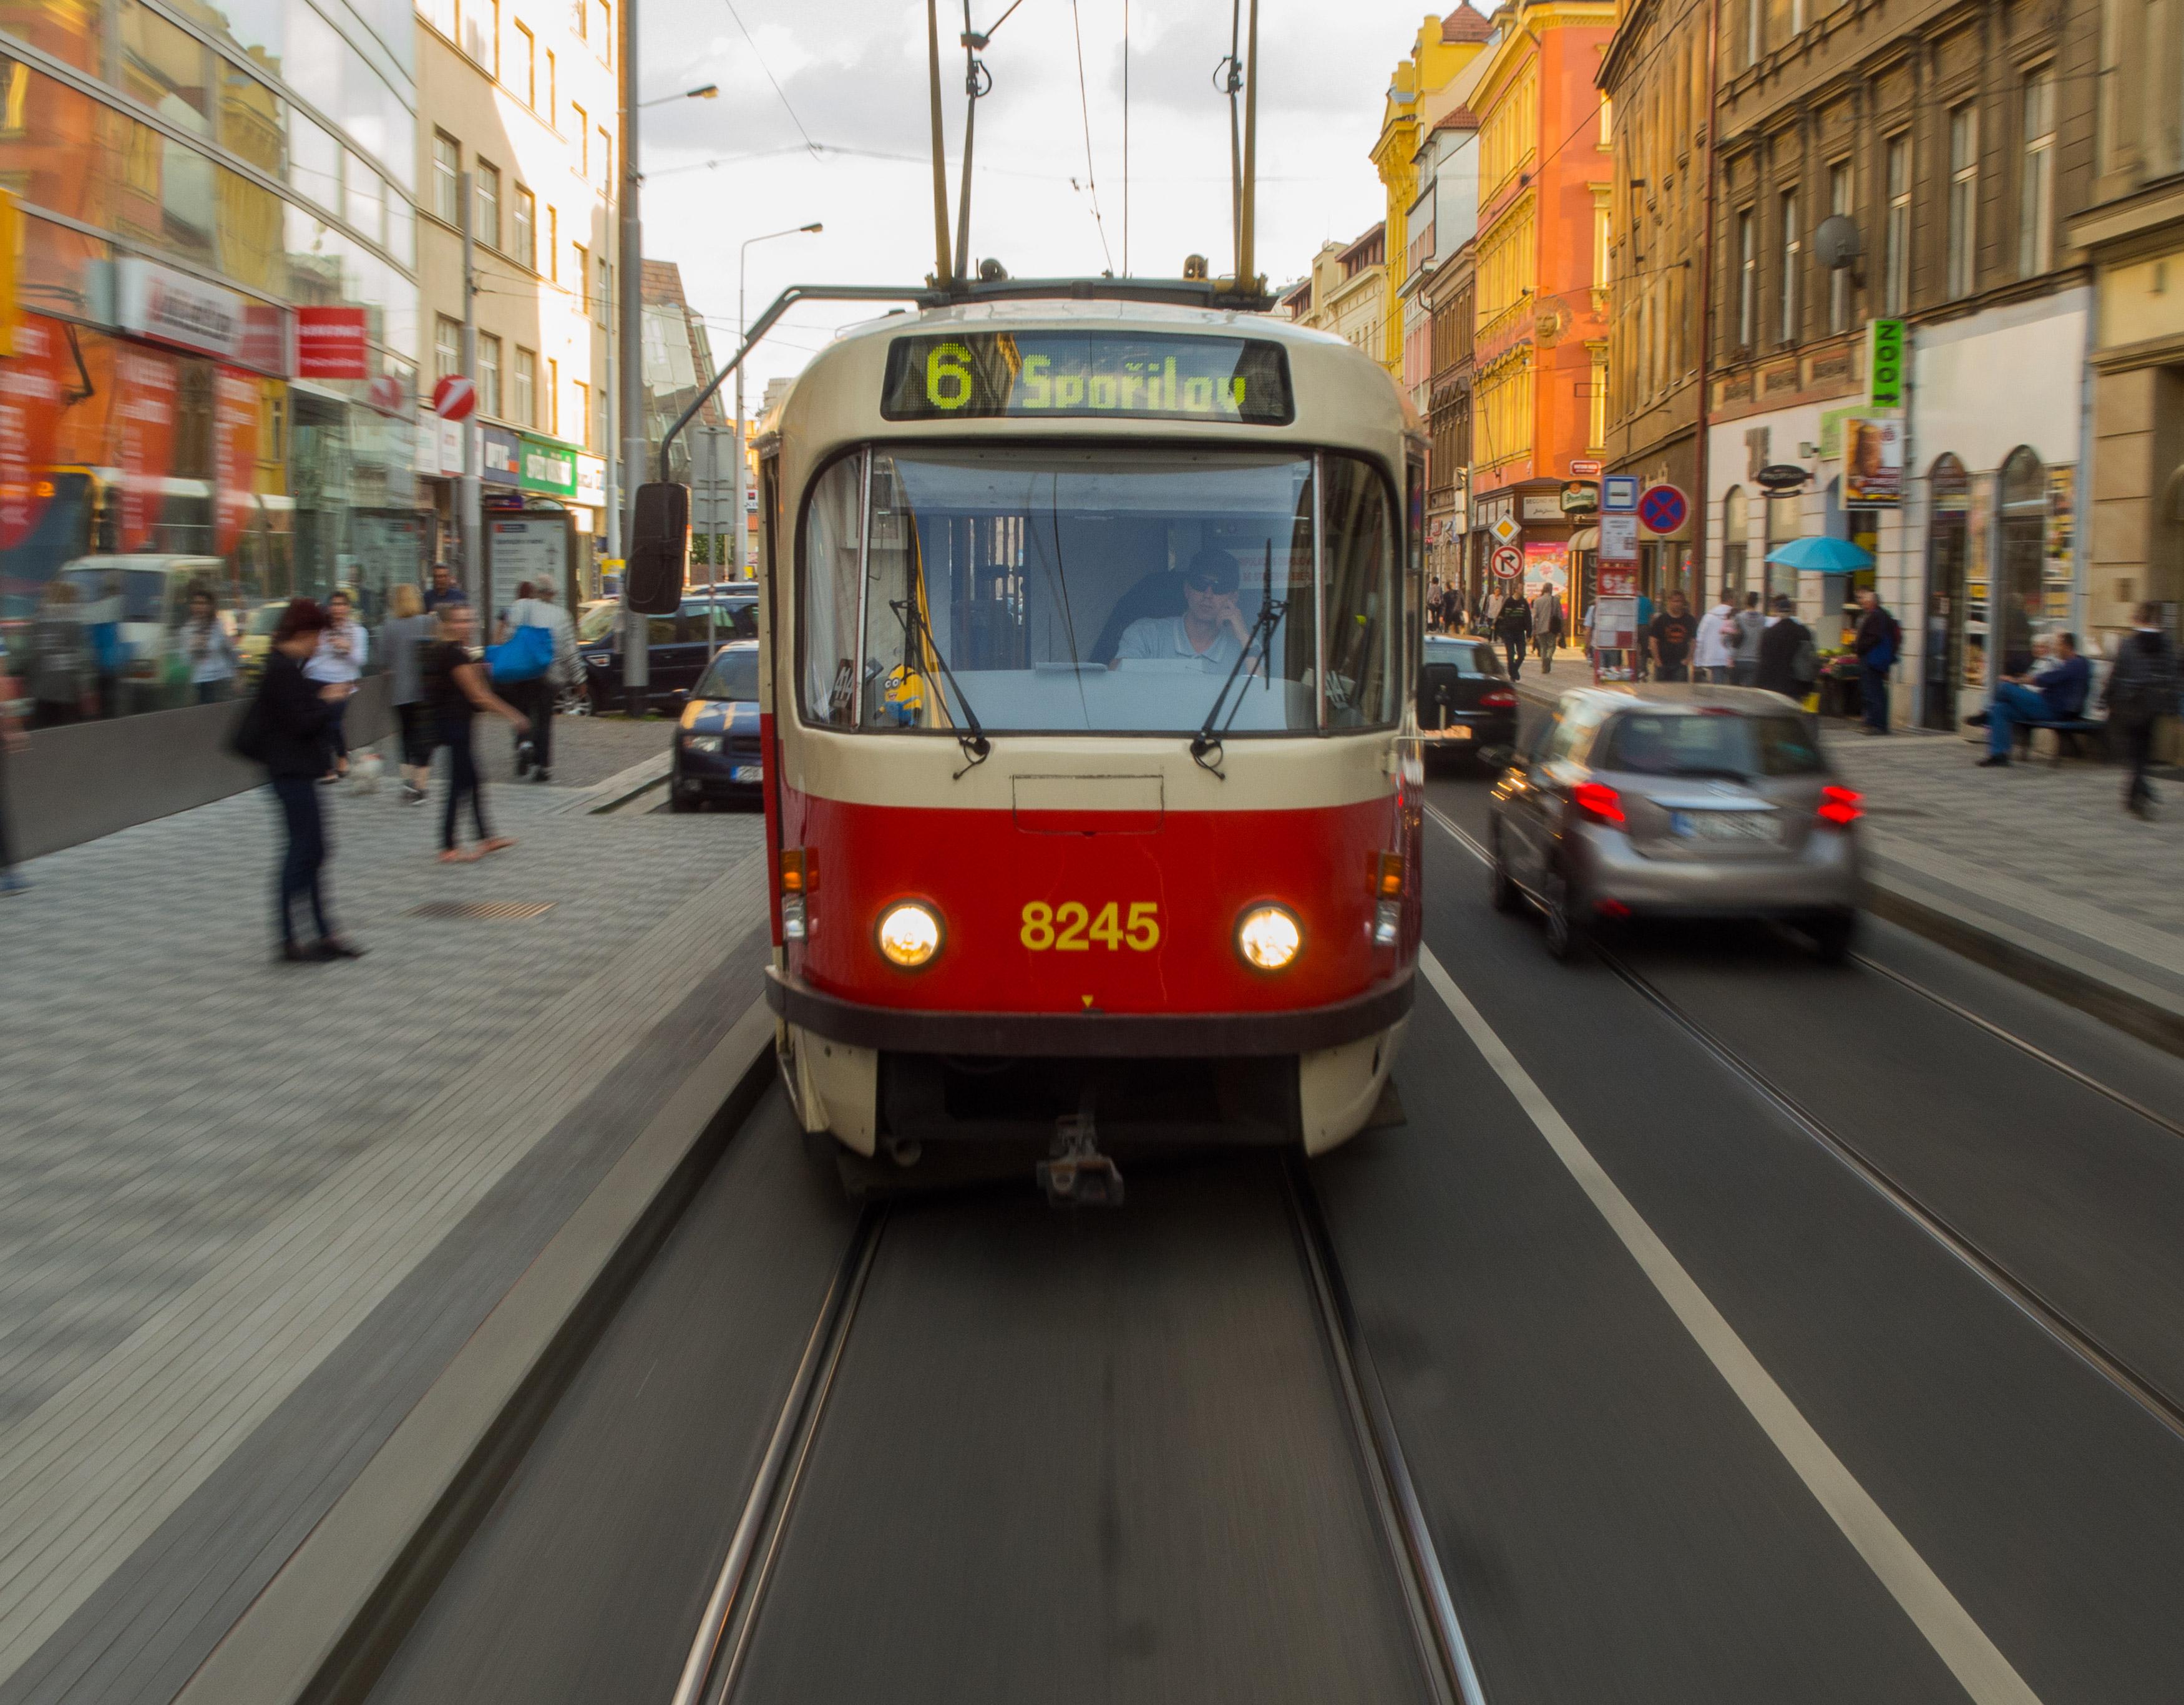 old tram prague street - photo #18